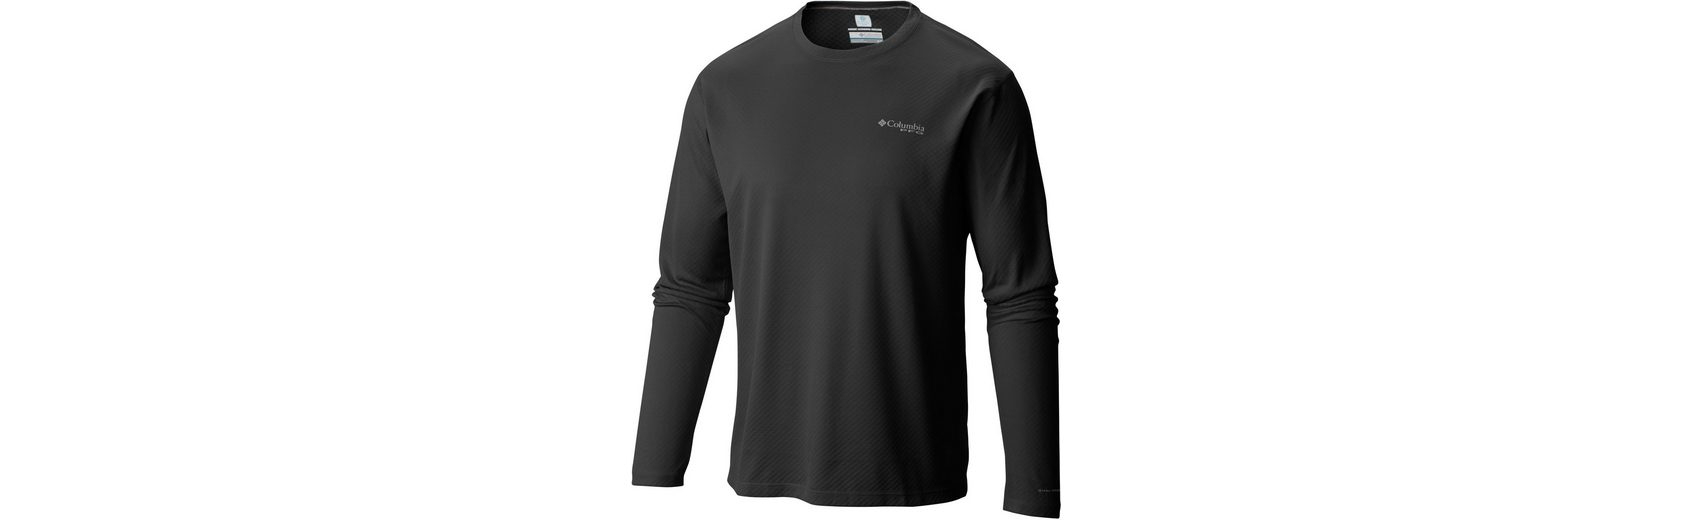 Columbia Sweatshirt Zero Rules LS Shirt Men Top-Qualität Verkauf Online iA7N8TnhY